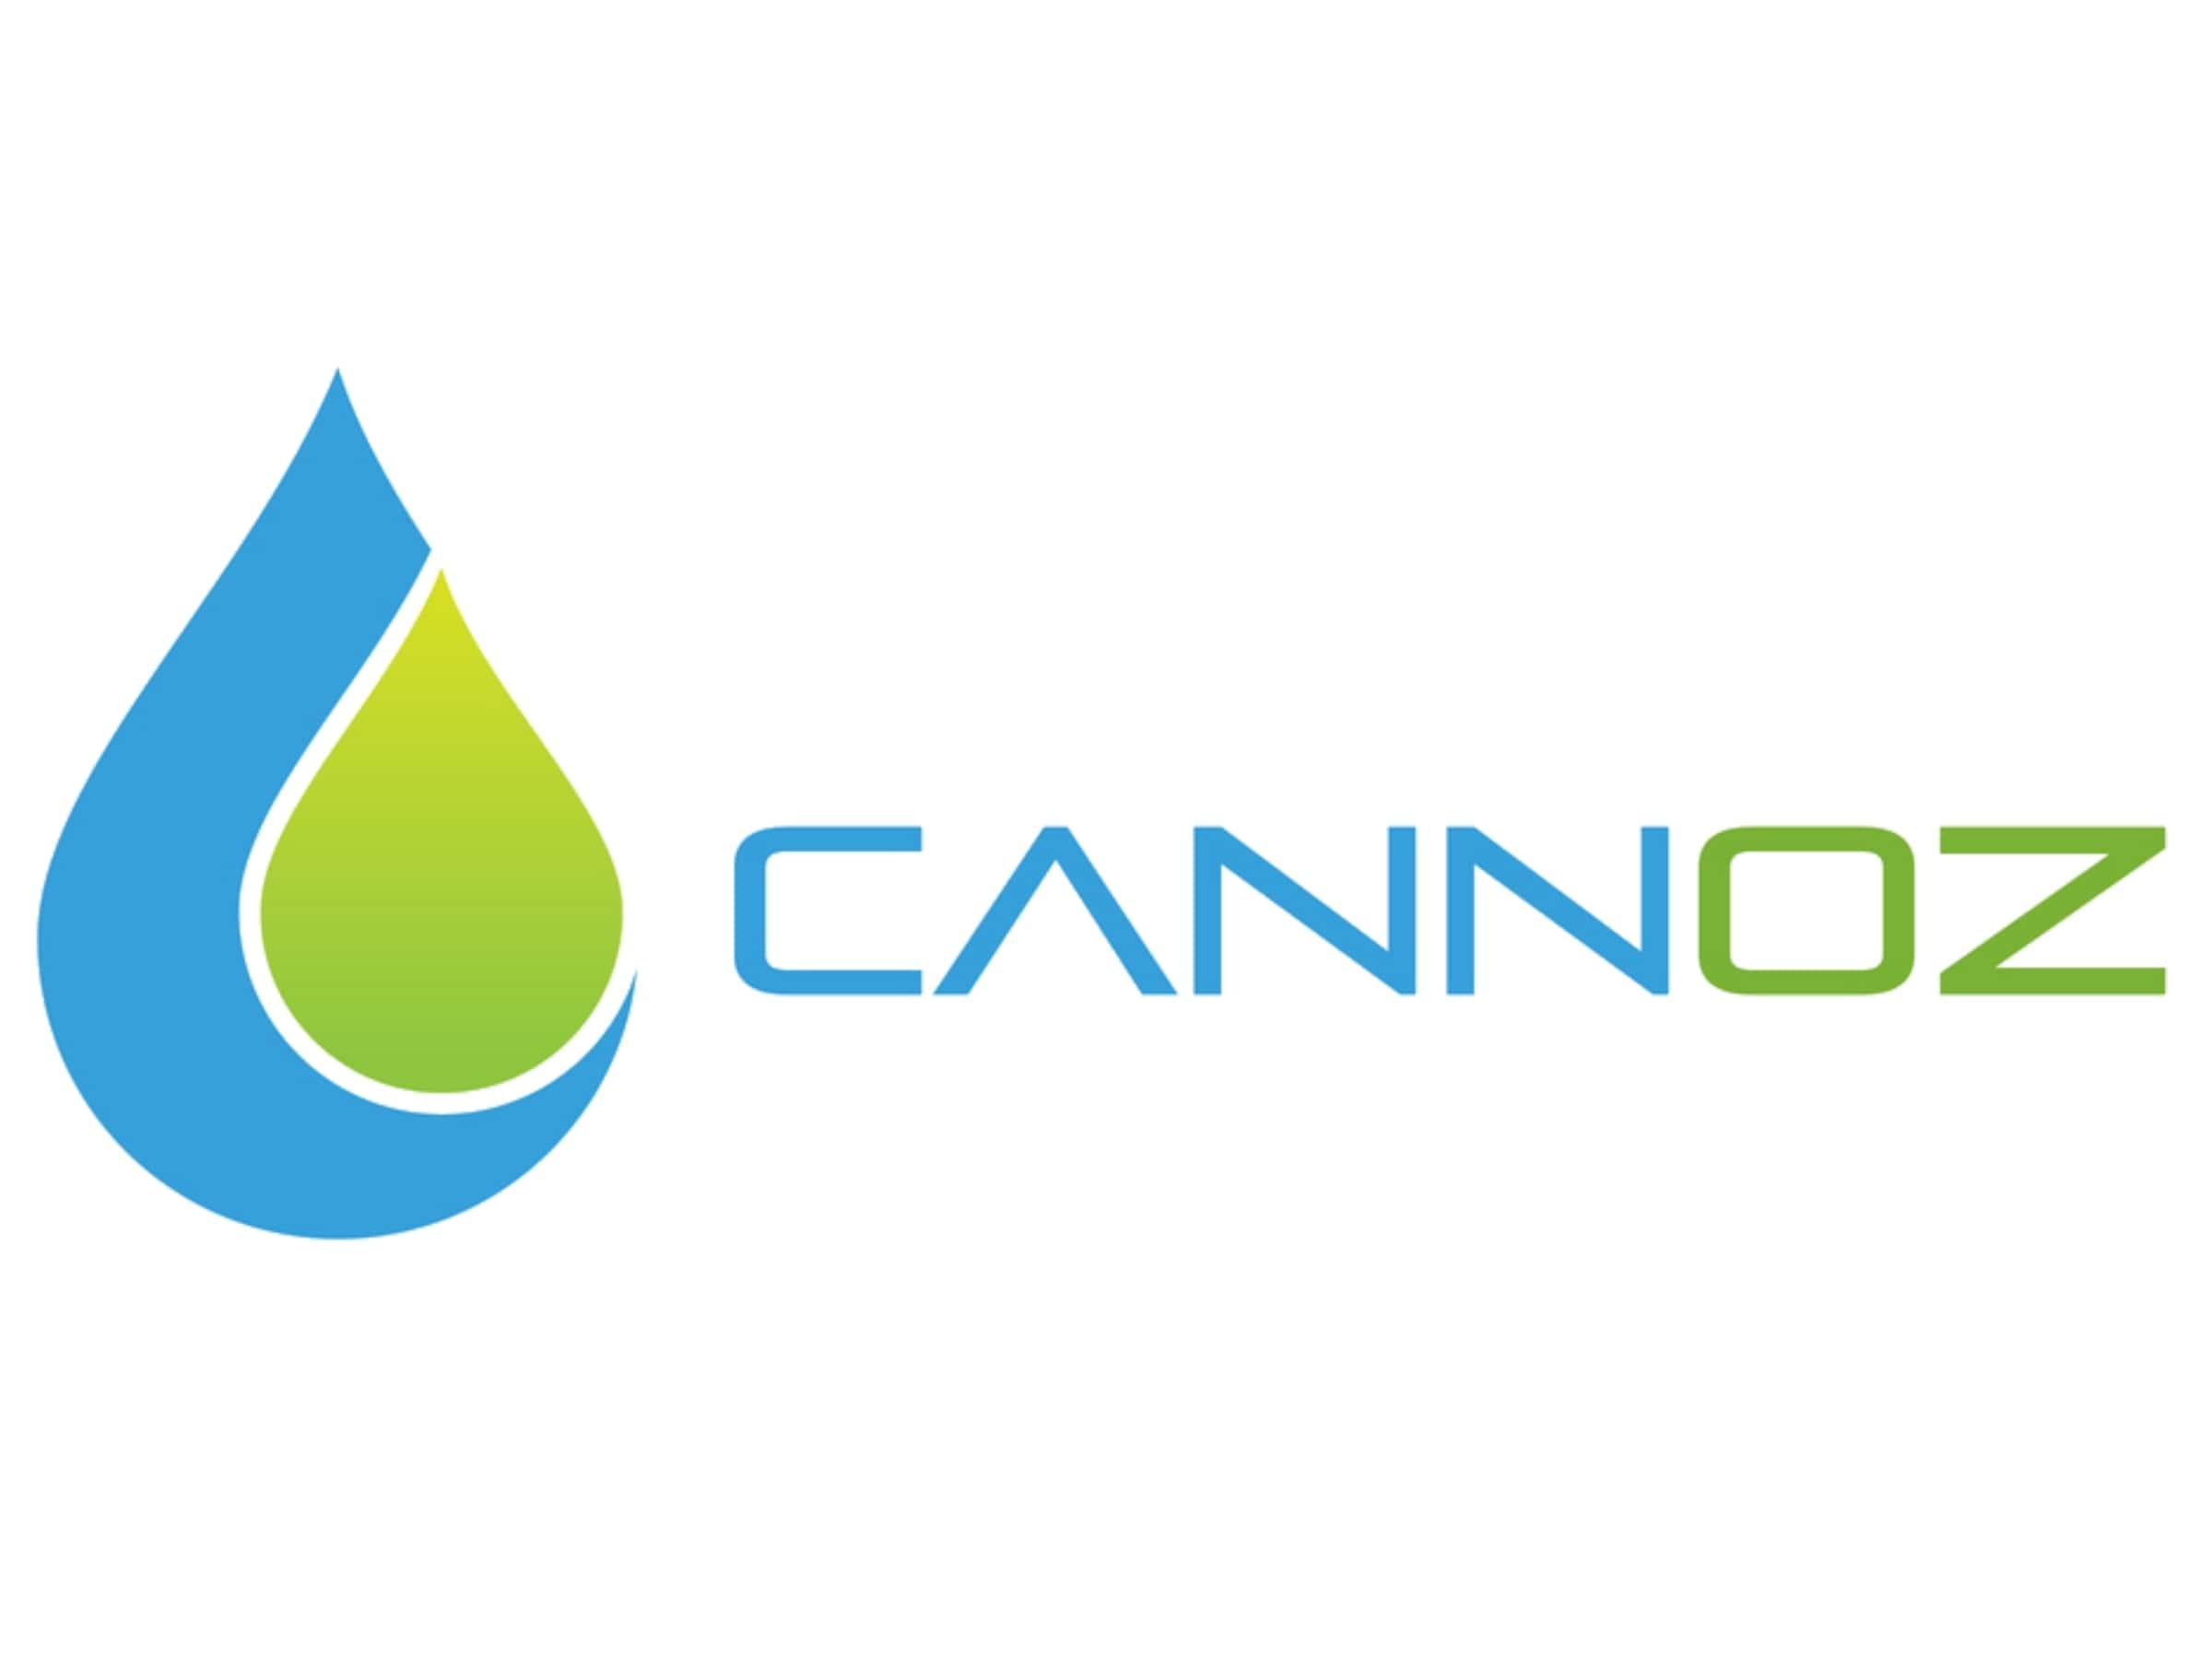 Cannoz Pty Ltd